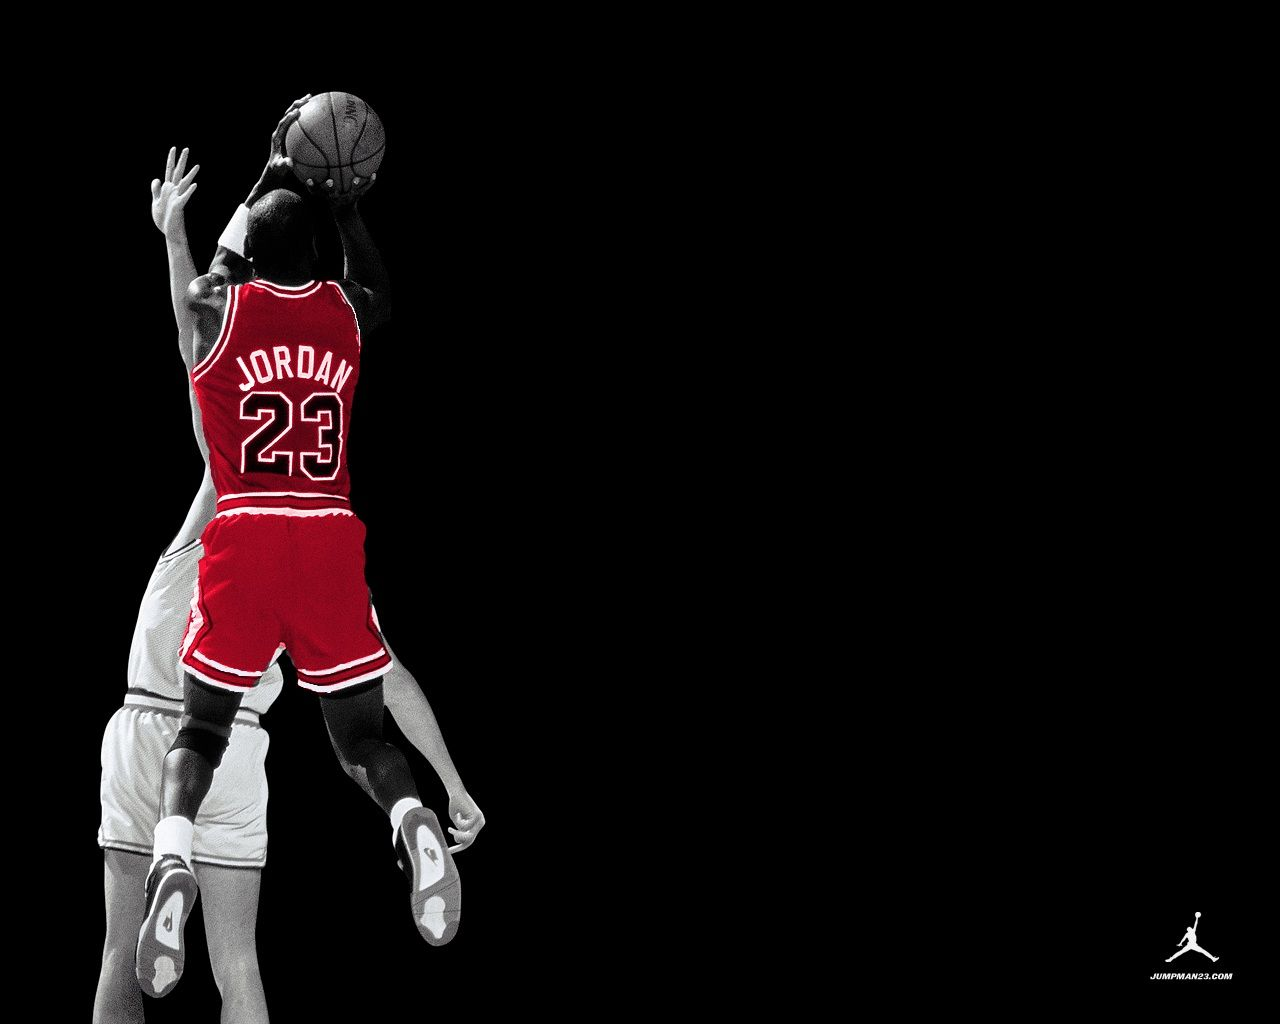 1stwallpaper Michael Jordan Black And White Michael Jordan Wallpapers Michael Jordan Hd Wallpaper